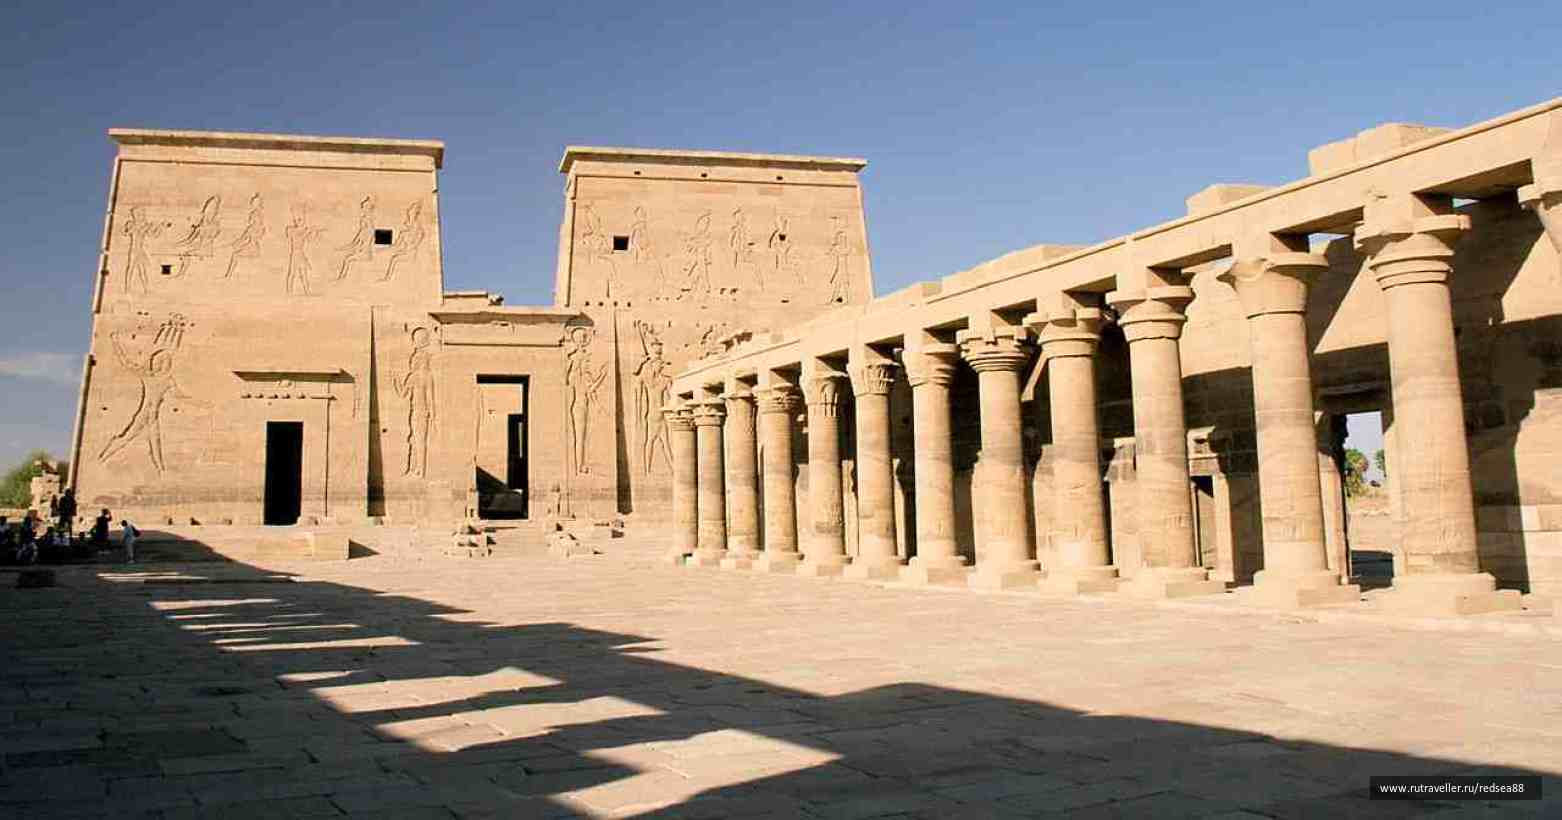 Philae,_First_Pylon_and_Columnade,_Aswan,_Egypt,_Oct_2004